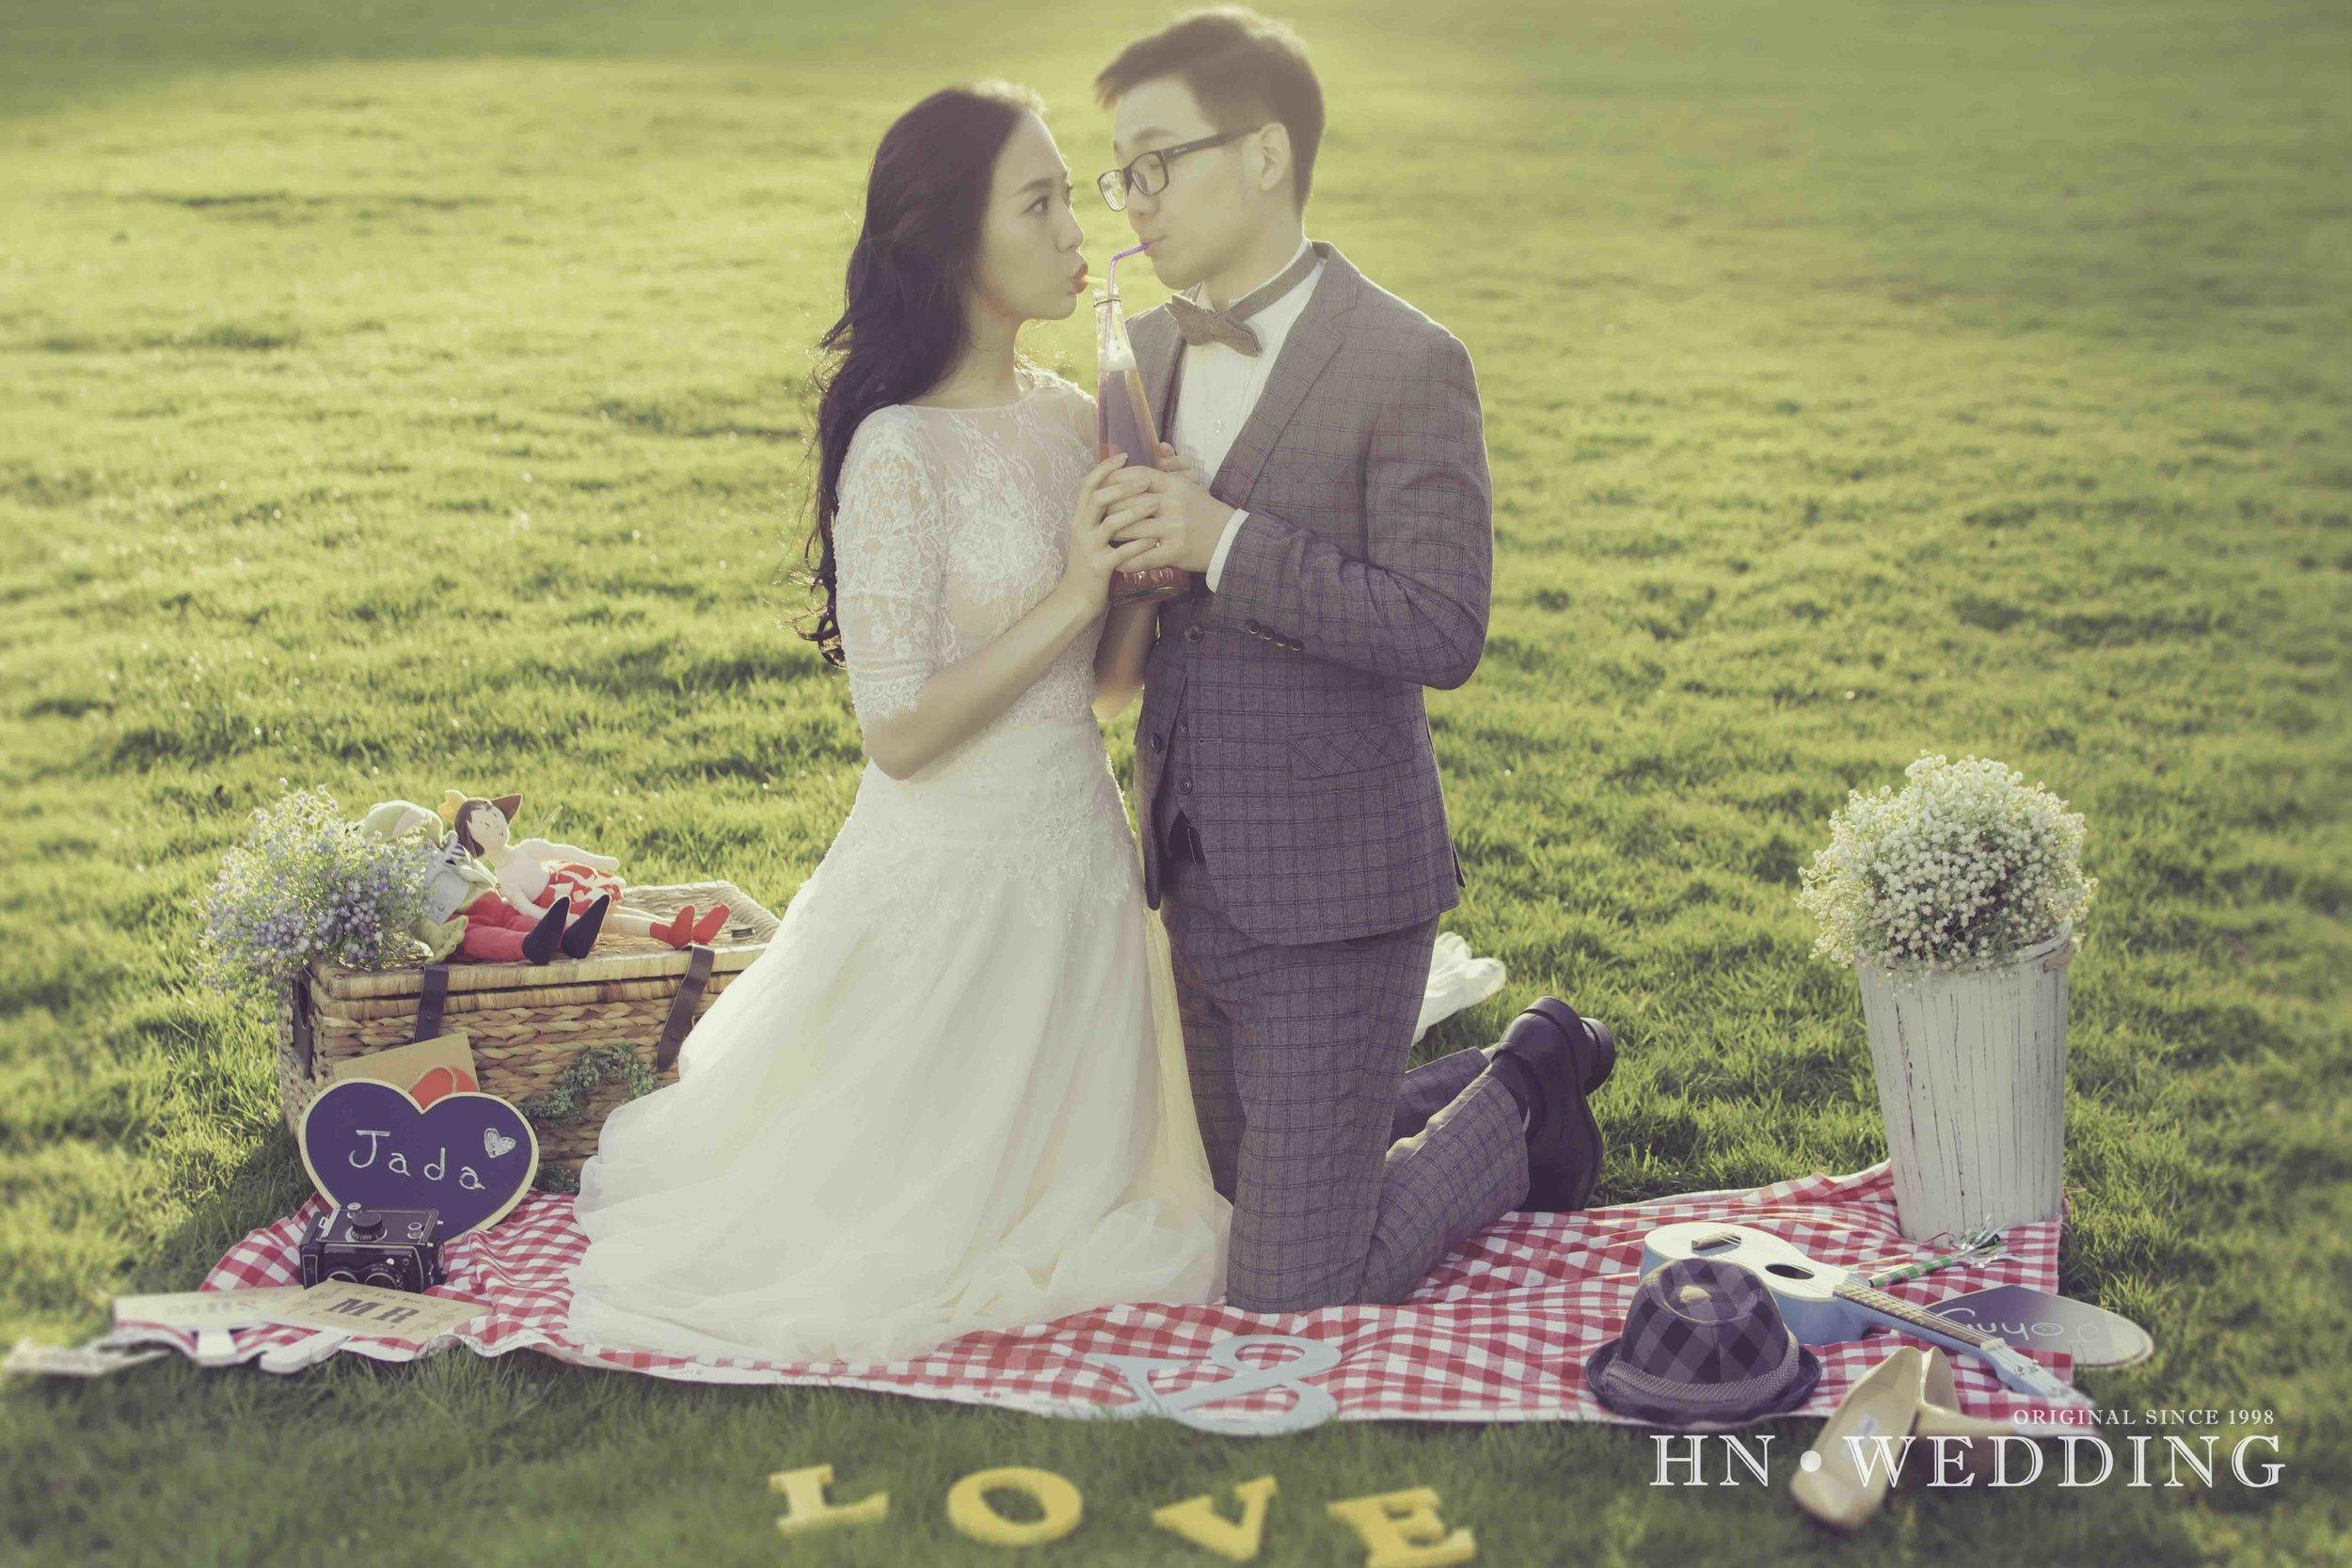 HNwedding-20170430-prewedding--26.jpg